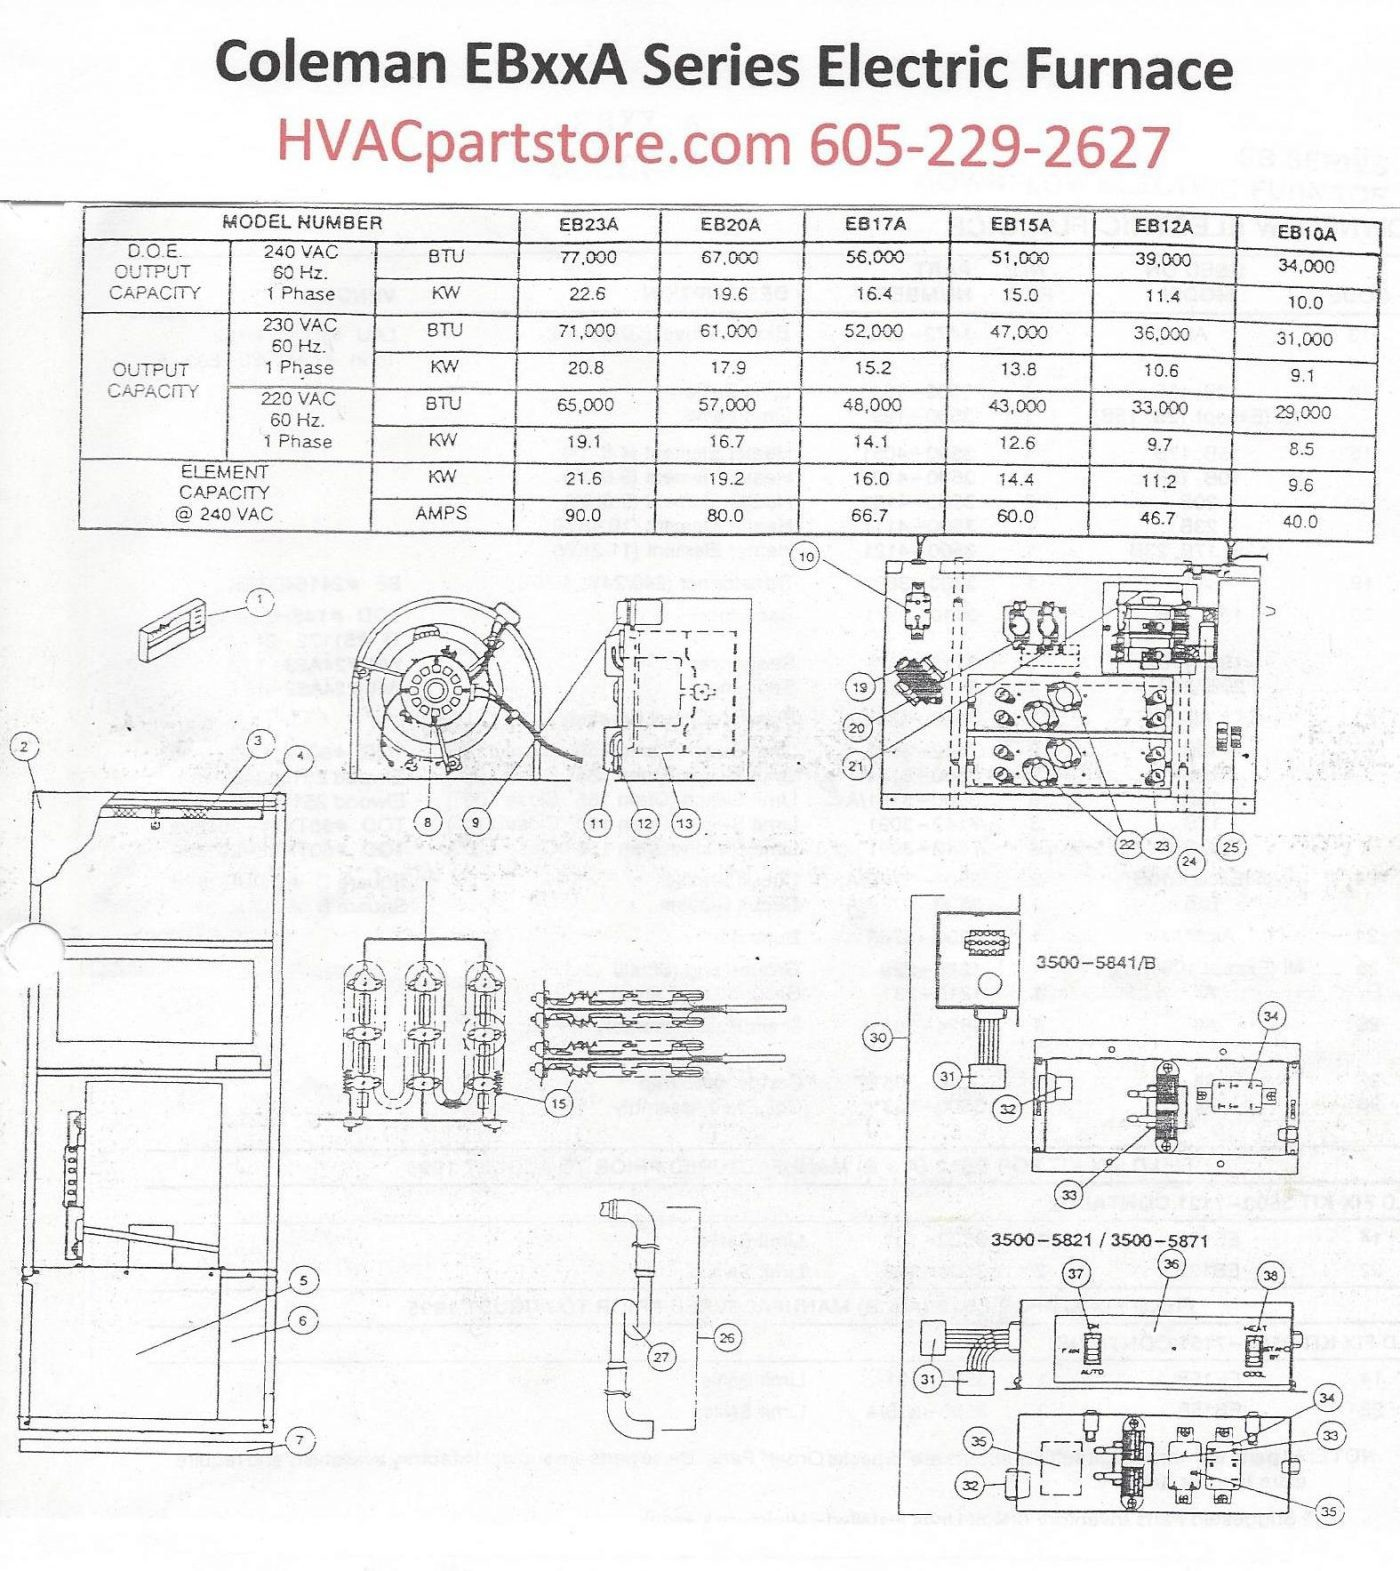 Dometic Rv thermostat Wiring Diagram Elegant Coleman Mach Air